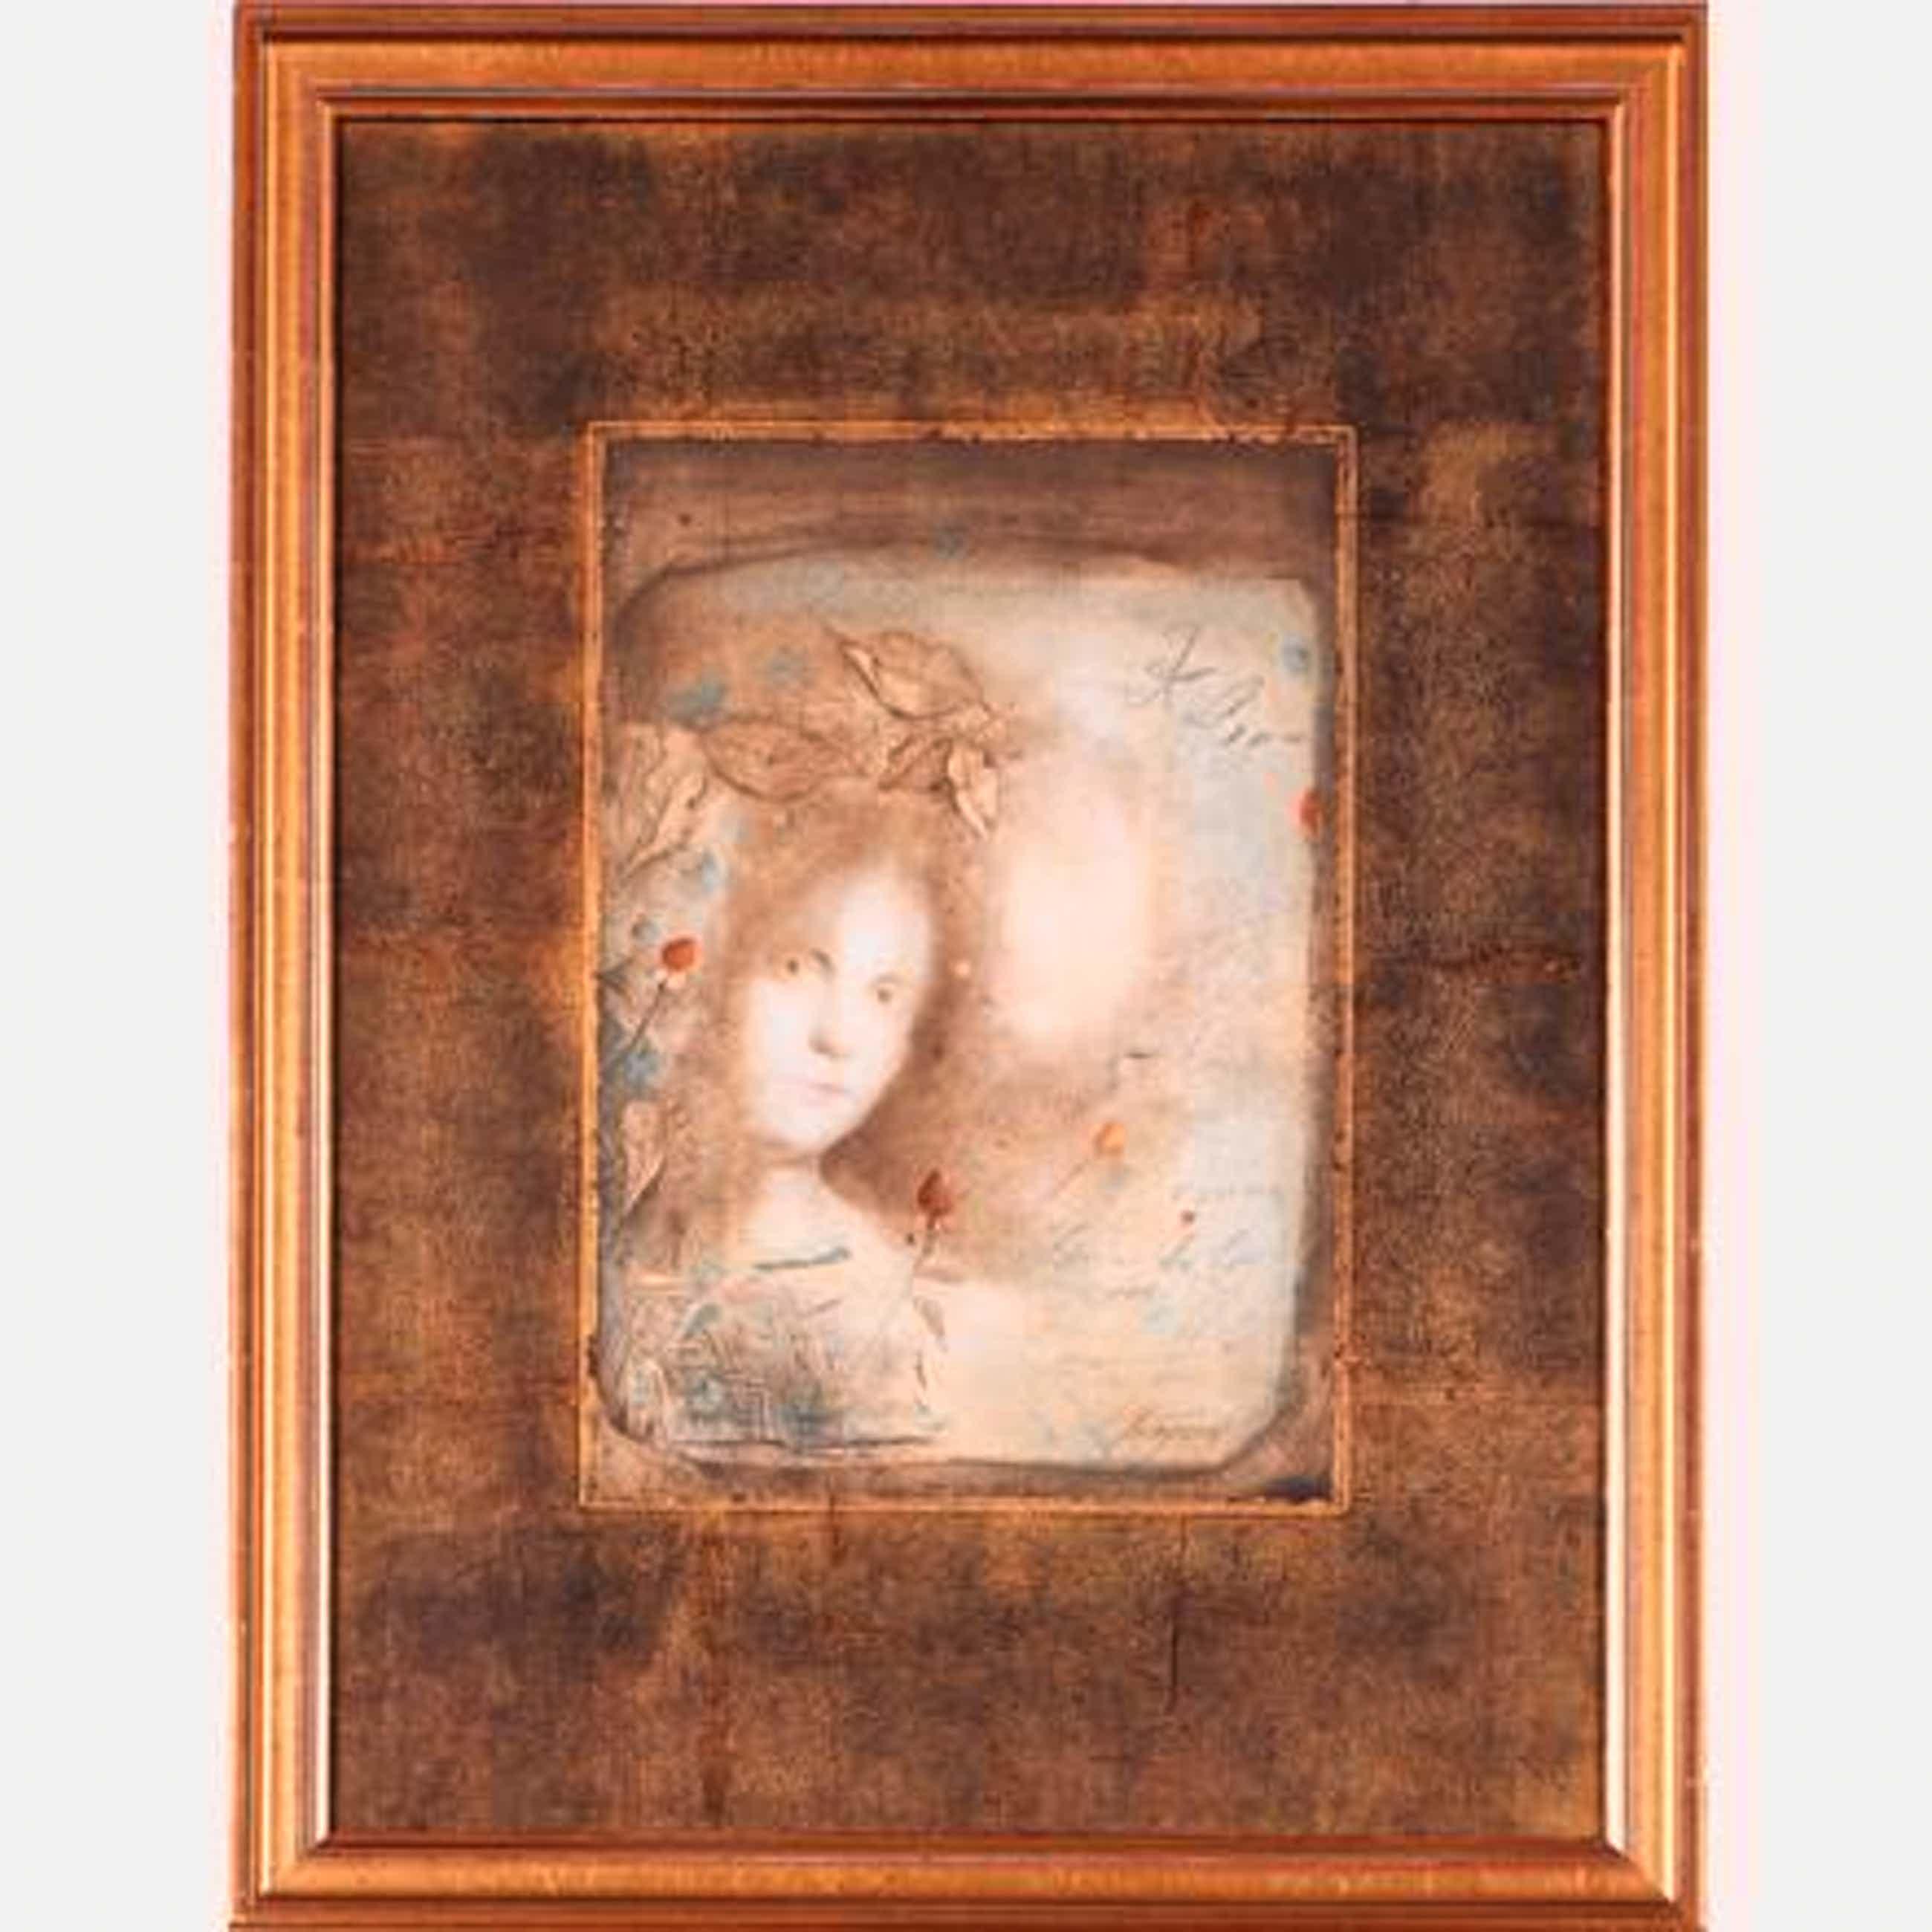 Mersad Berber - Porträt einer jungen Frau mit geschlossenen Rosen, umgeben von Textframenten kopen? Bied vanaf 190!